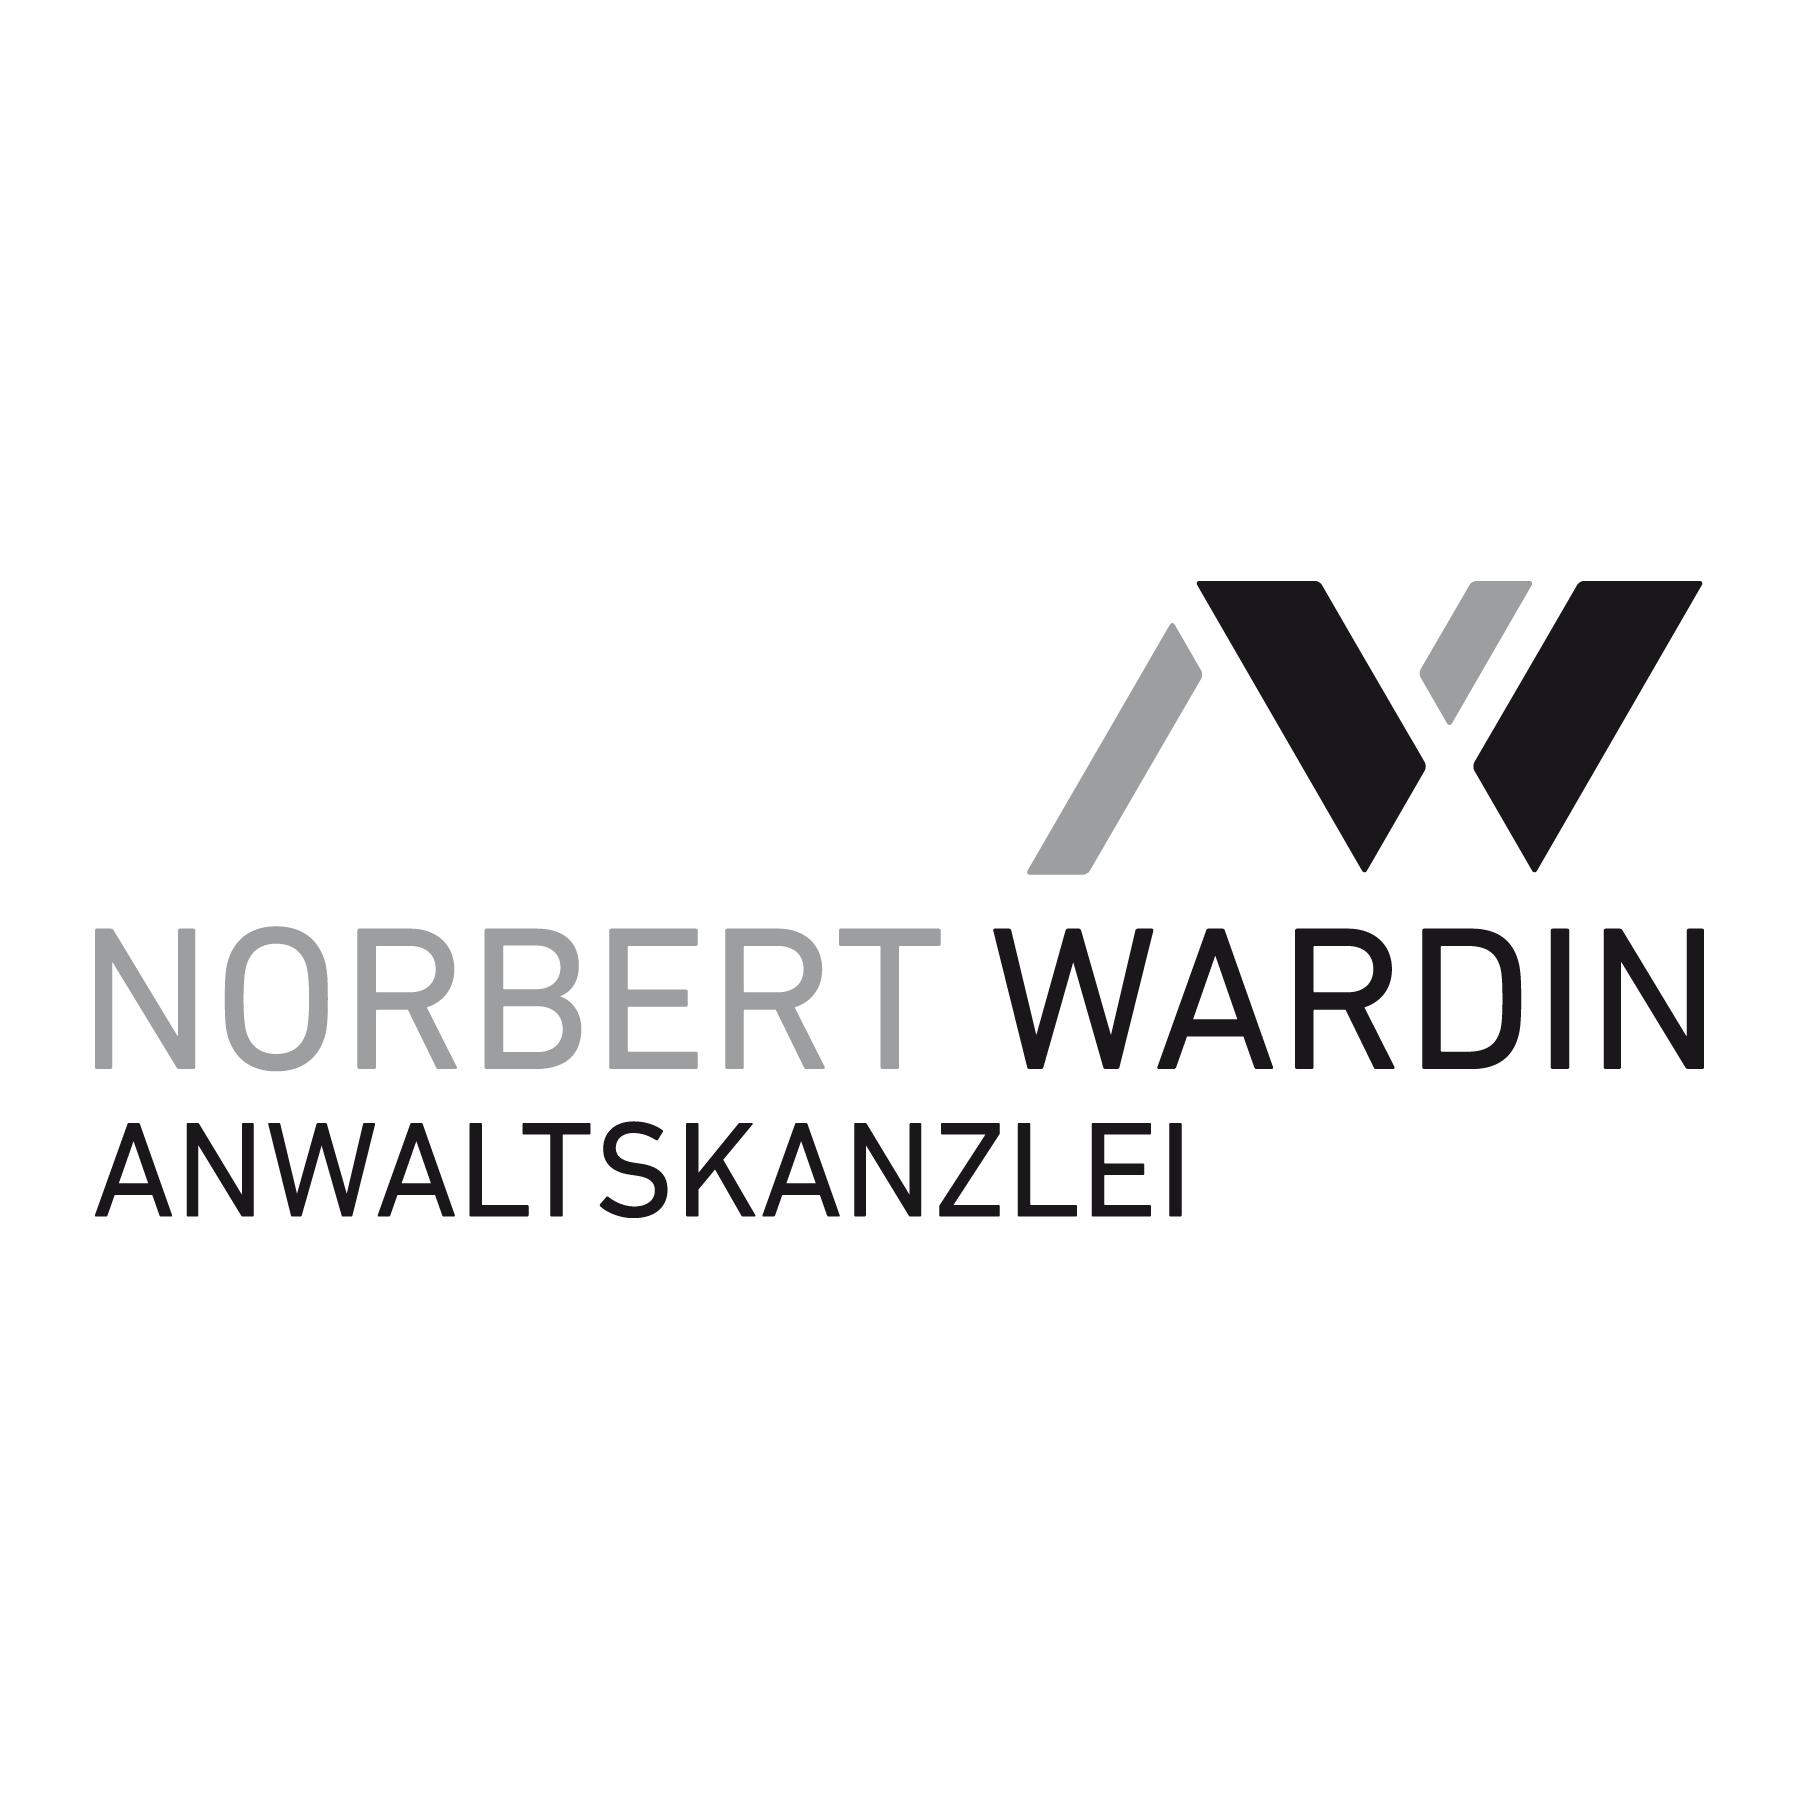 Anwaltskanzlei Wardin